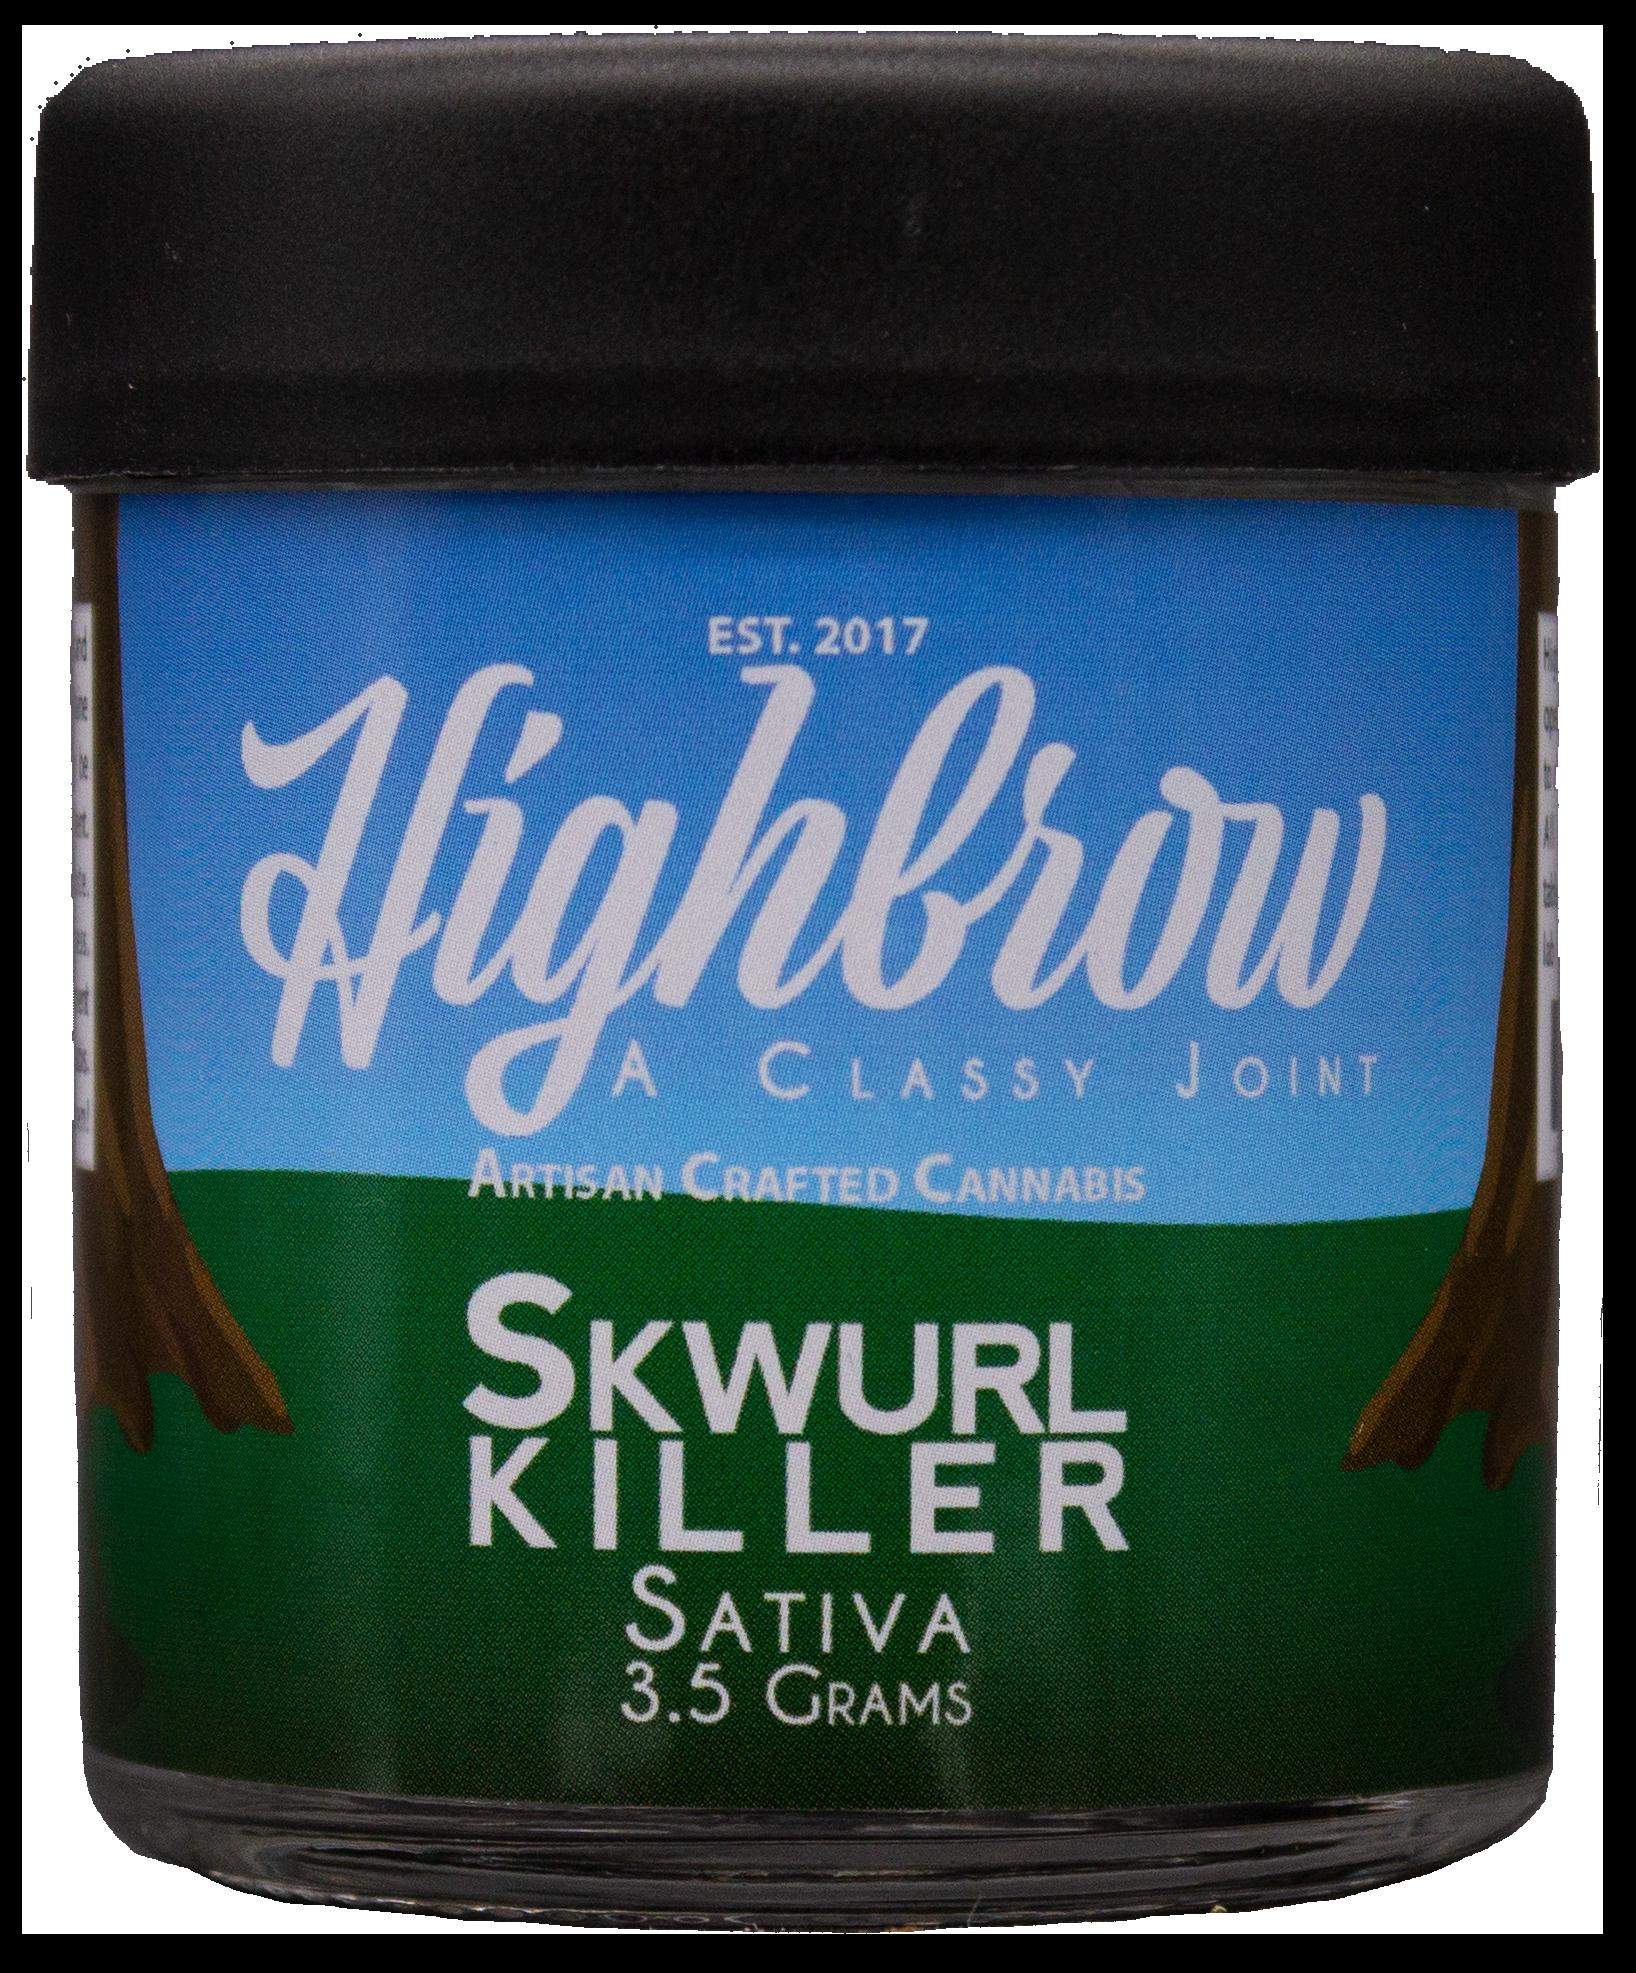 Skwurl Killer - Worth the hunt.